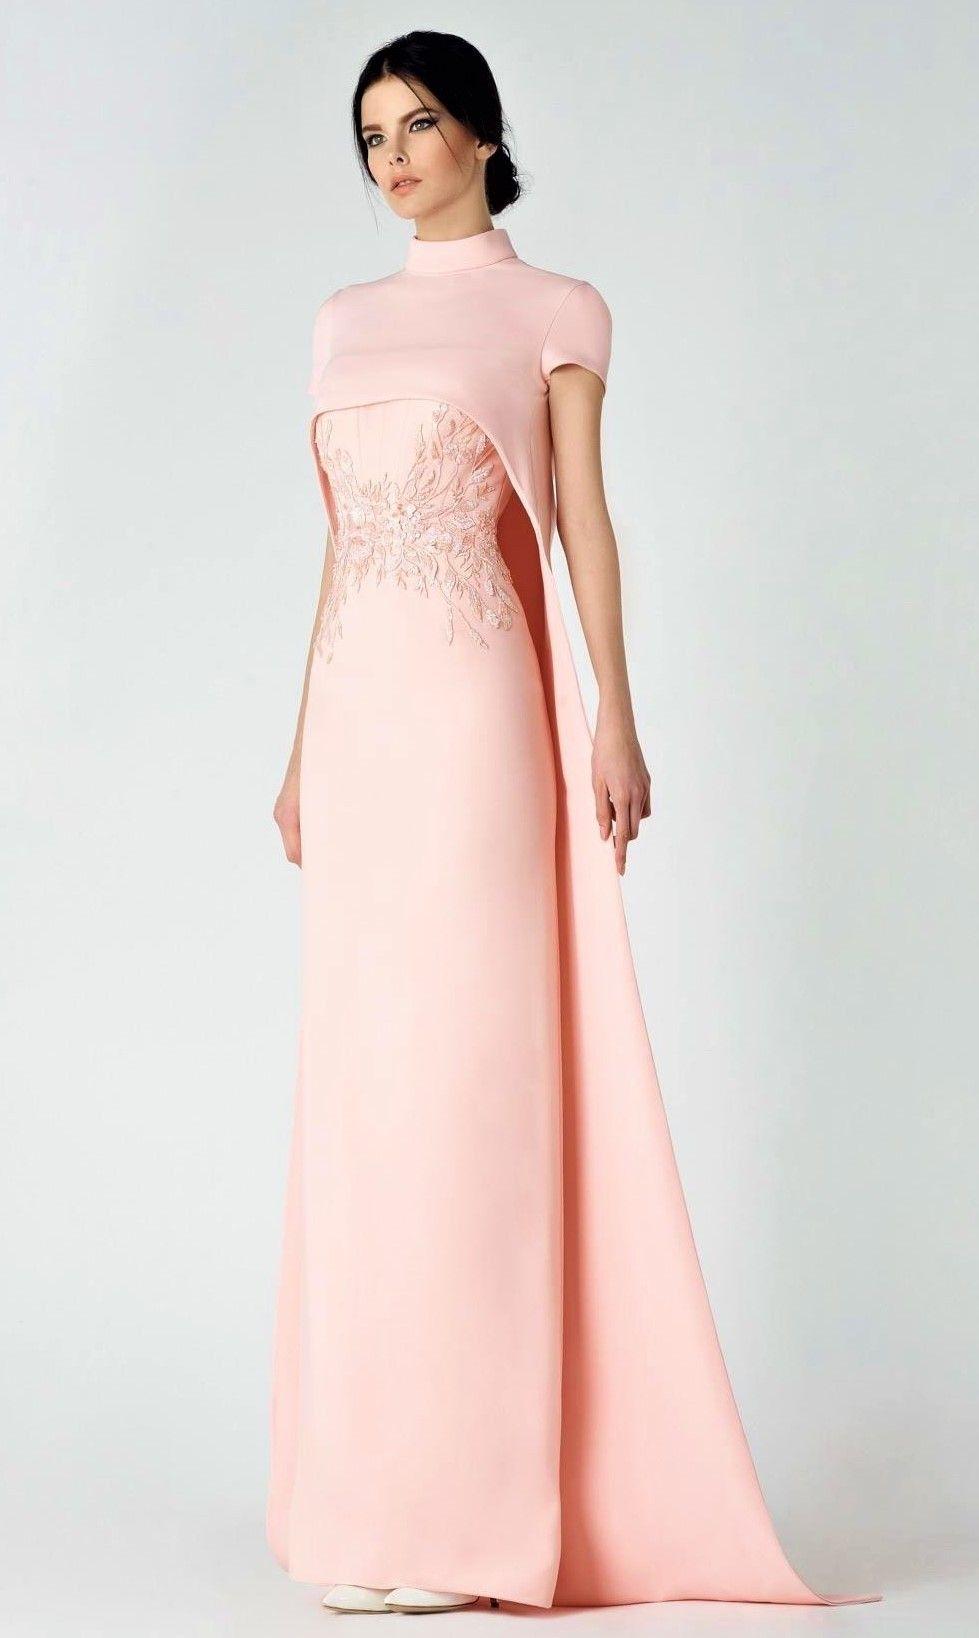 Dress for princess leia organa saiid kobeisy fallwinter